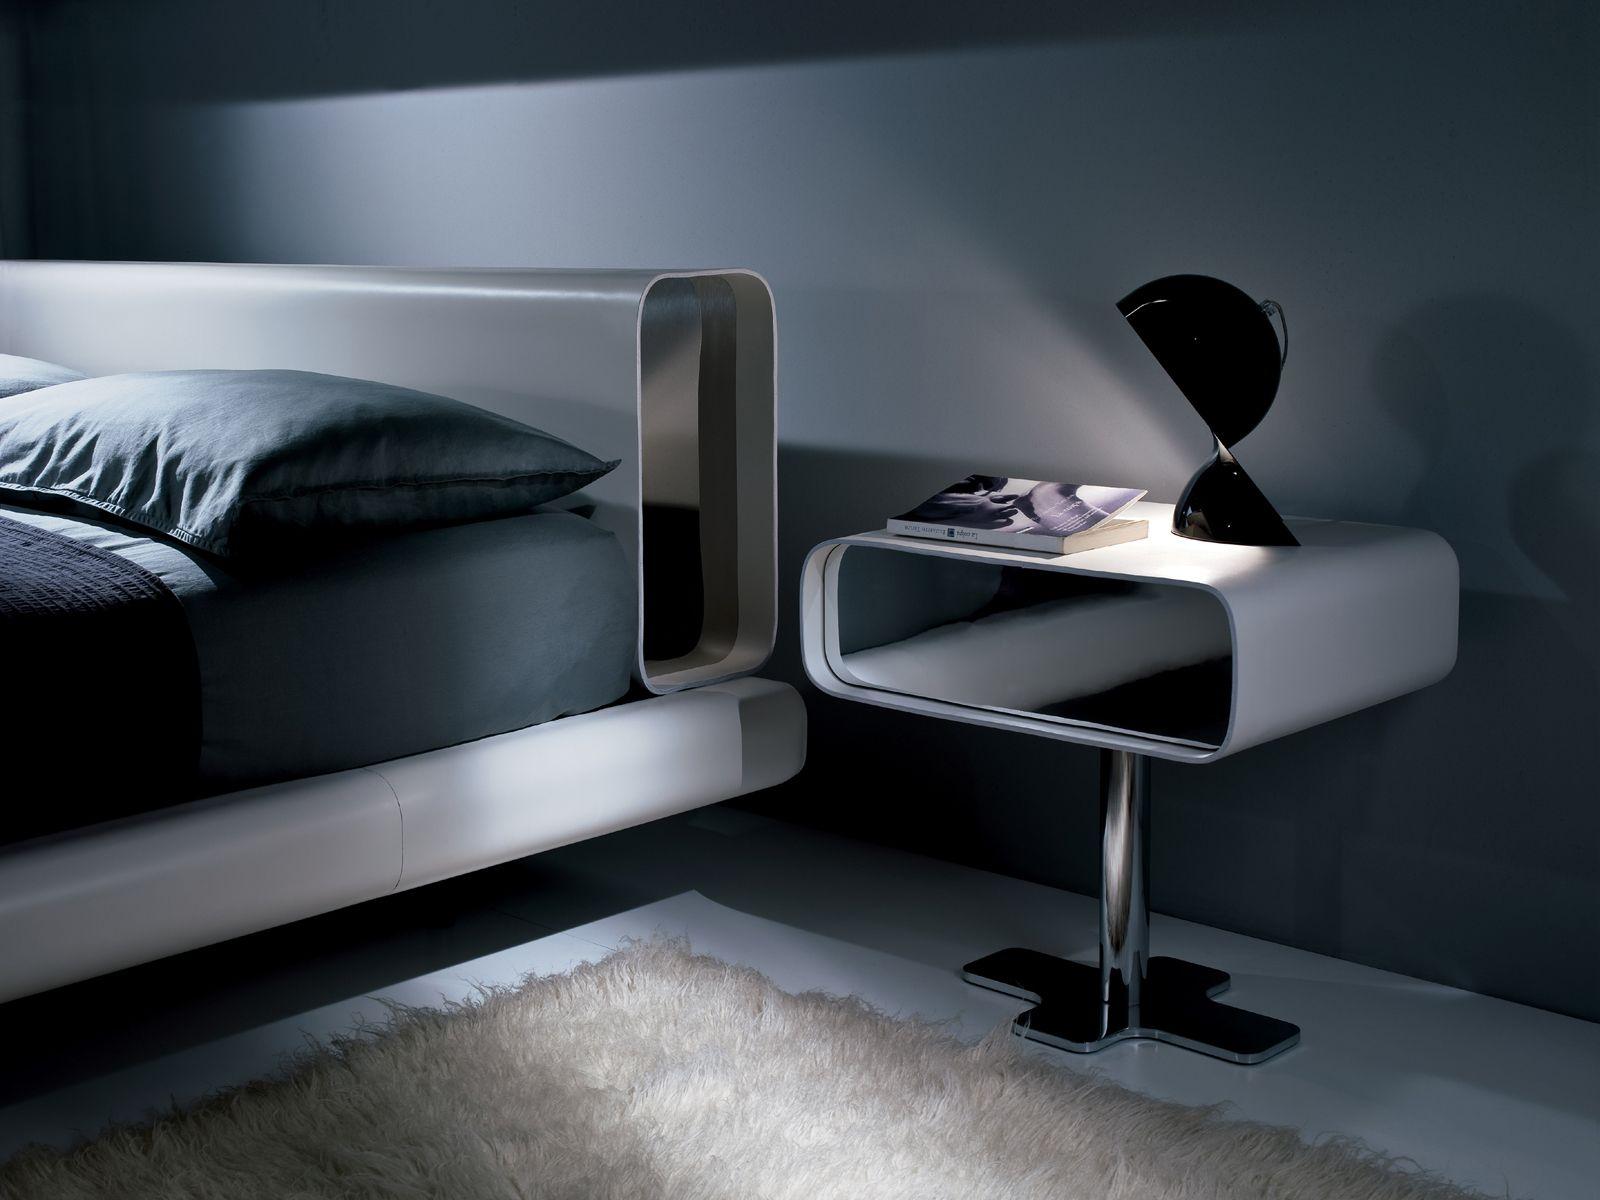 table de nuit en bois massif avec tiroirs collection tube by i 4 mariani design mauro lipparini. Black Bedroom Furniture Sets. Home Design Ideas